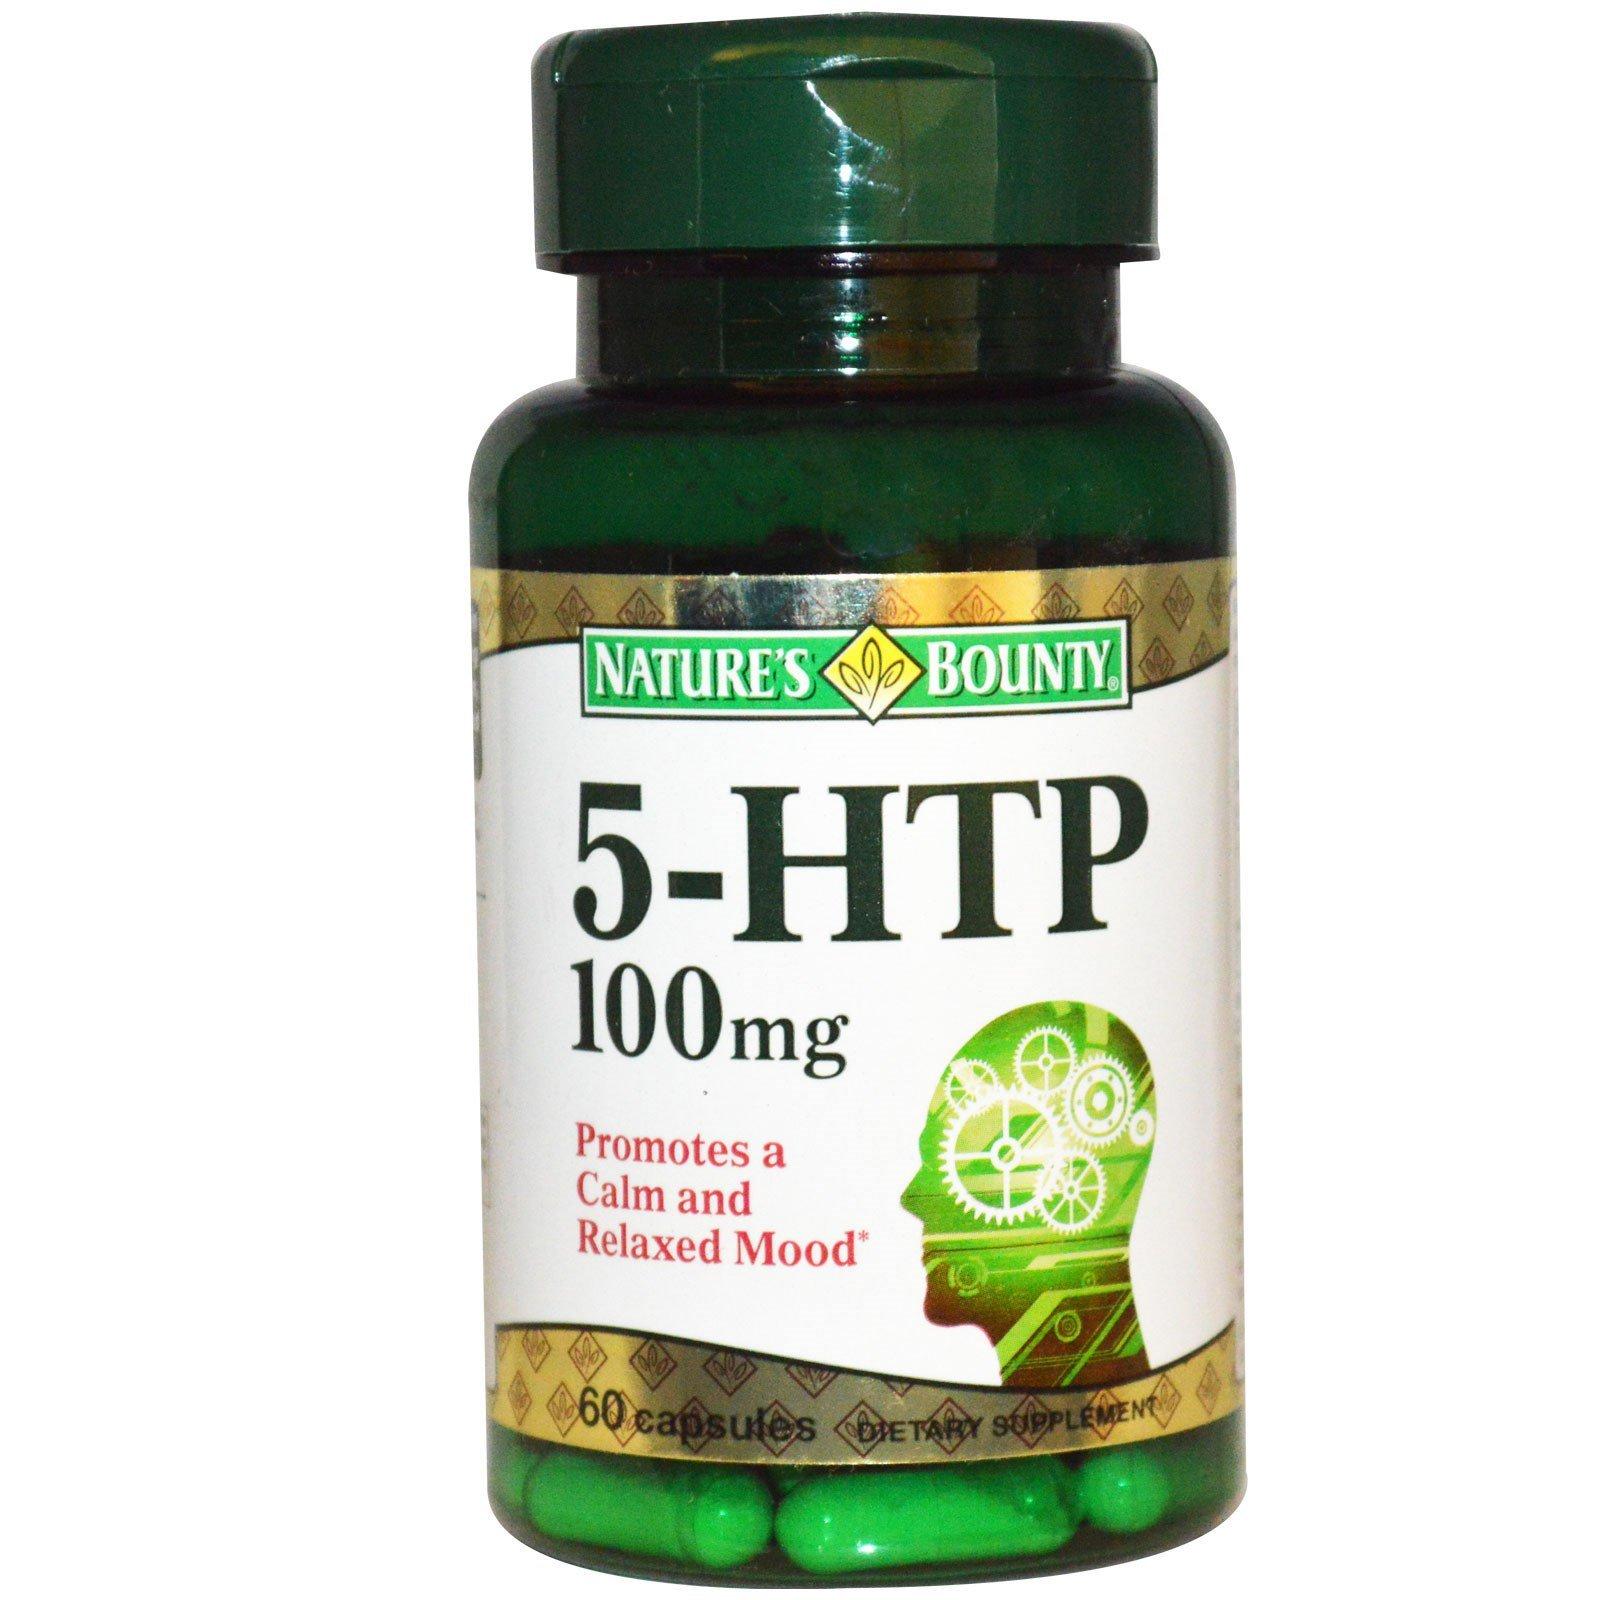 Nature's Bounty 5-HTP 100 mg Capsules 60 ea (Pack of 3)